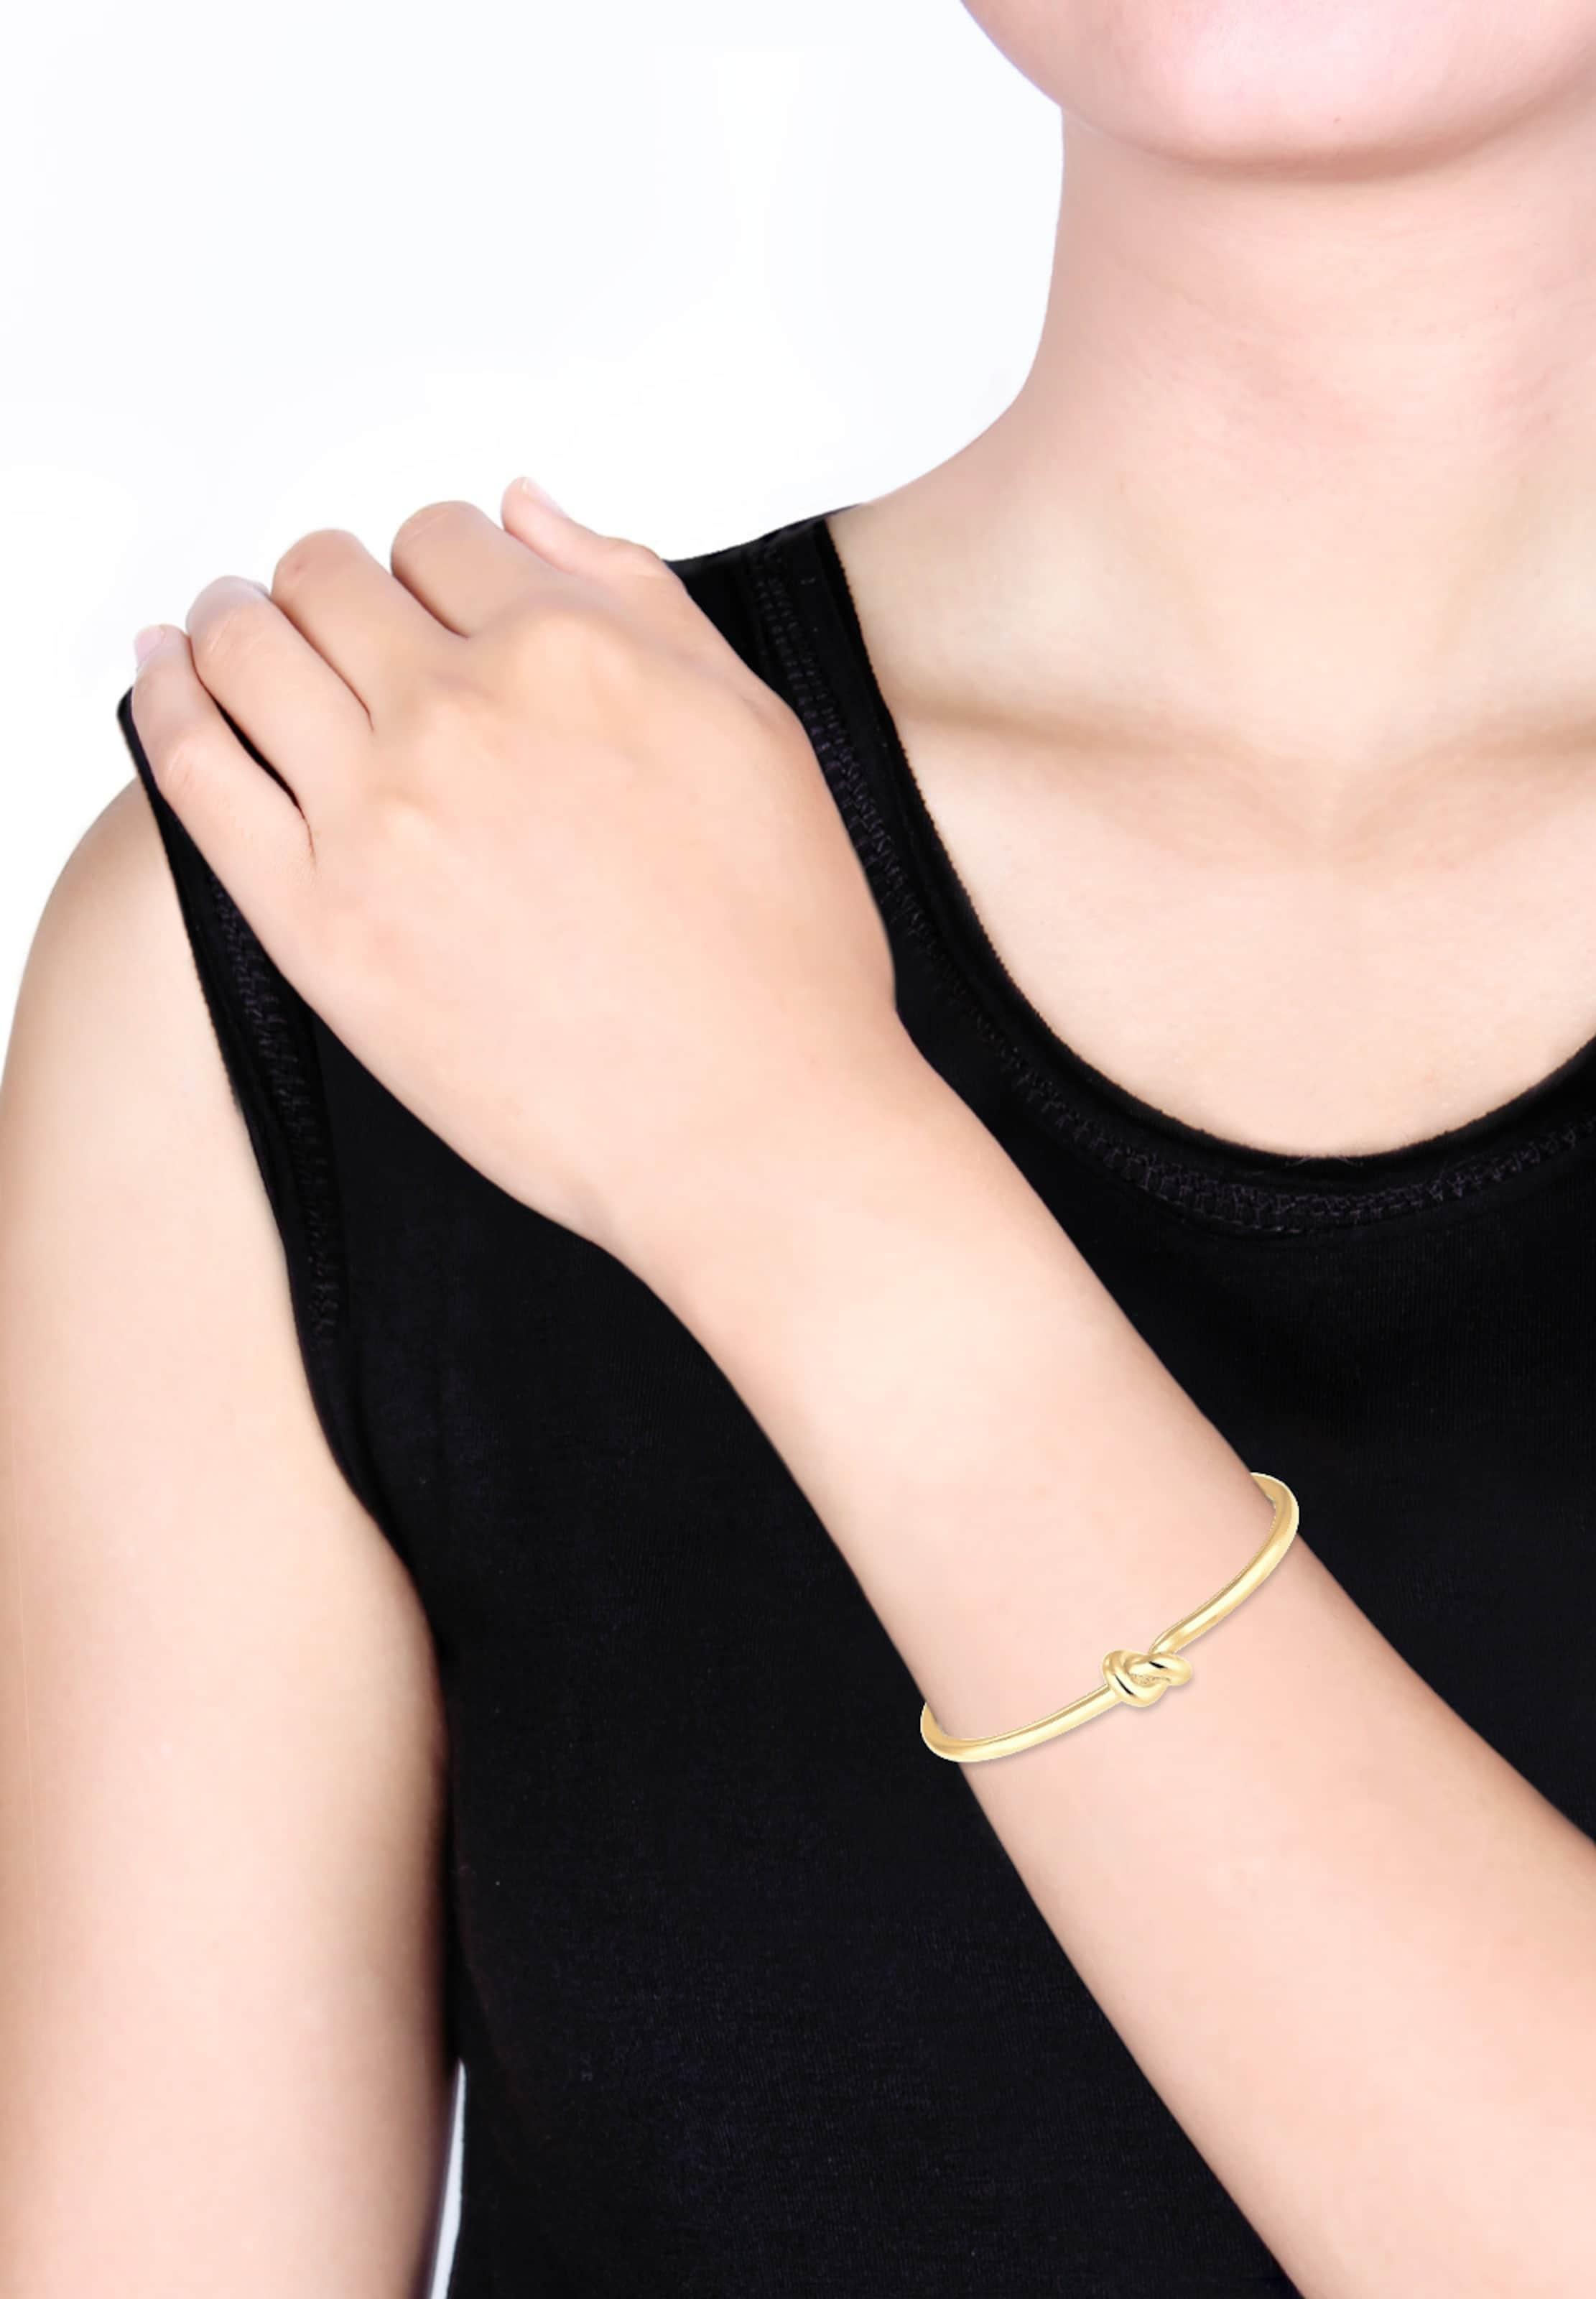 Armband Armband Elli In Gold In In Elli Elli Gold In Armband Armband Elli Gold c3LqAR4j5S